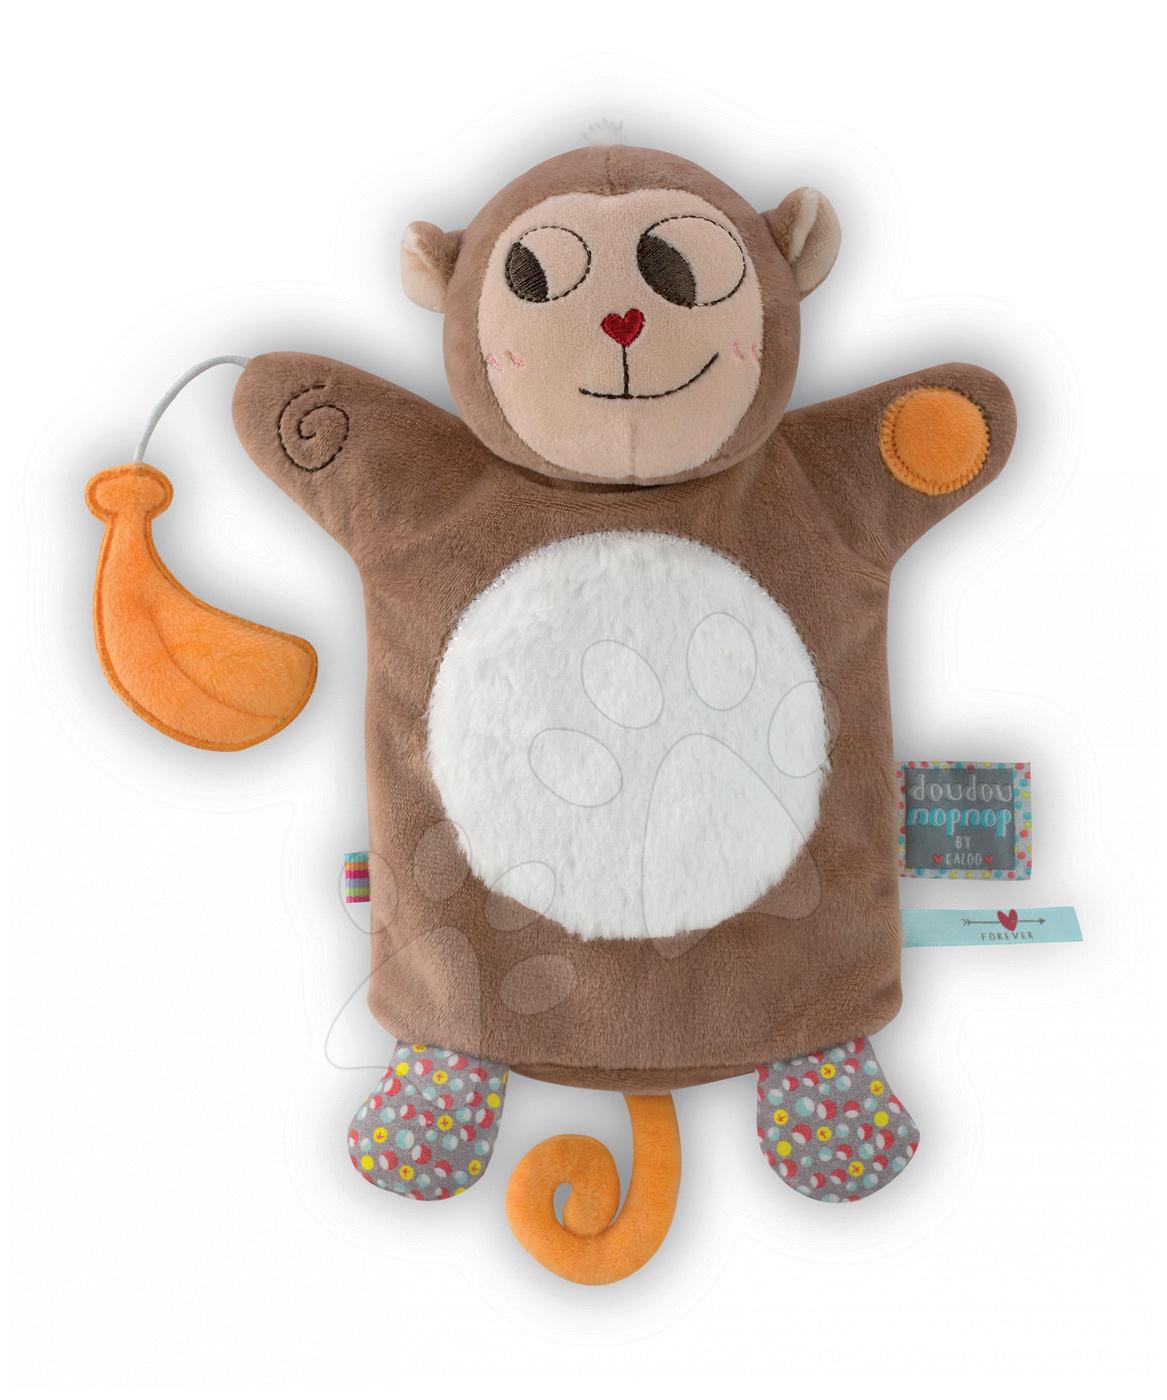 Bábky pre najmenších - Plyšová opička bábkové divadlo Nopnop-Banana Monkey Doudou Kaloo 25 cm pre najmenších